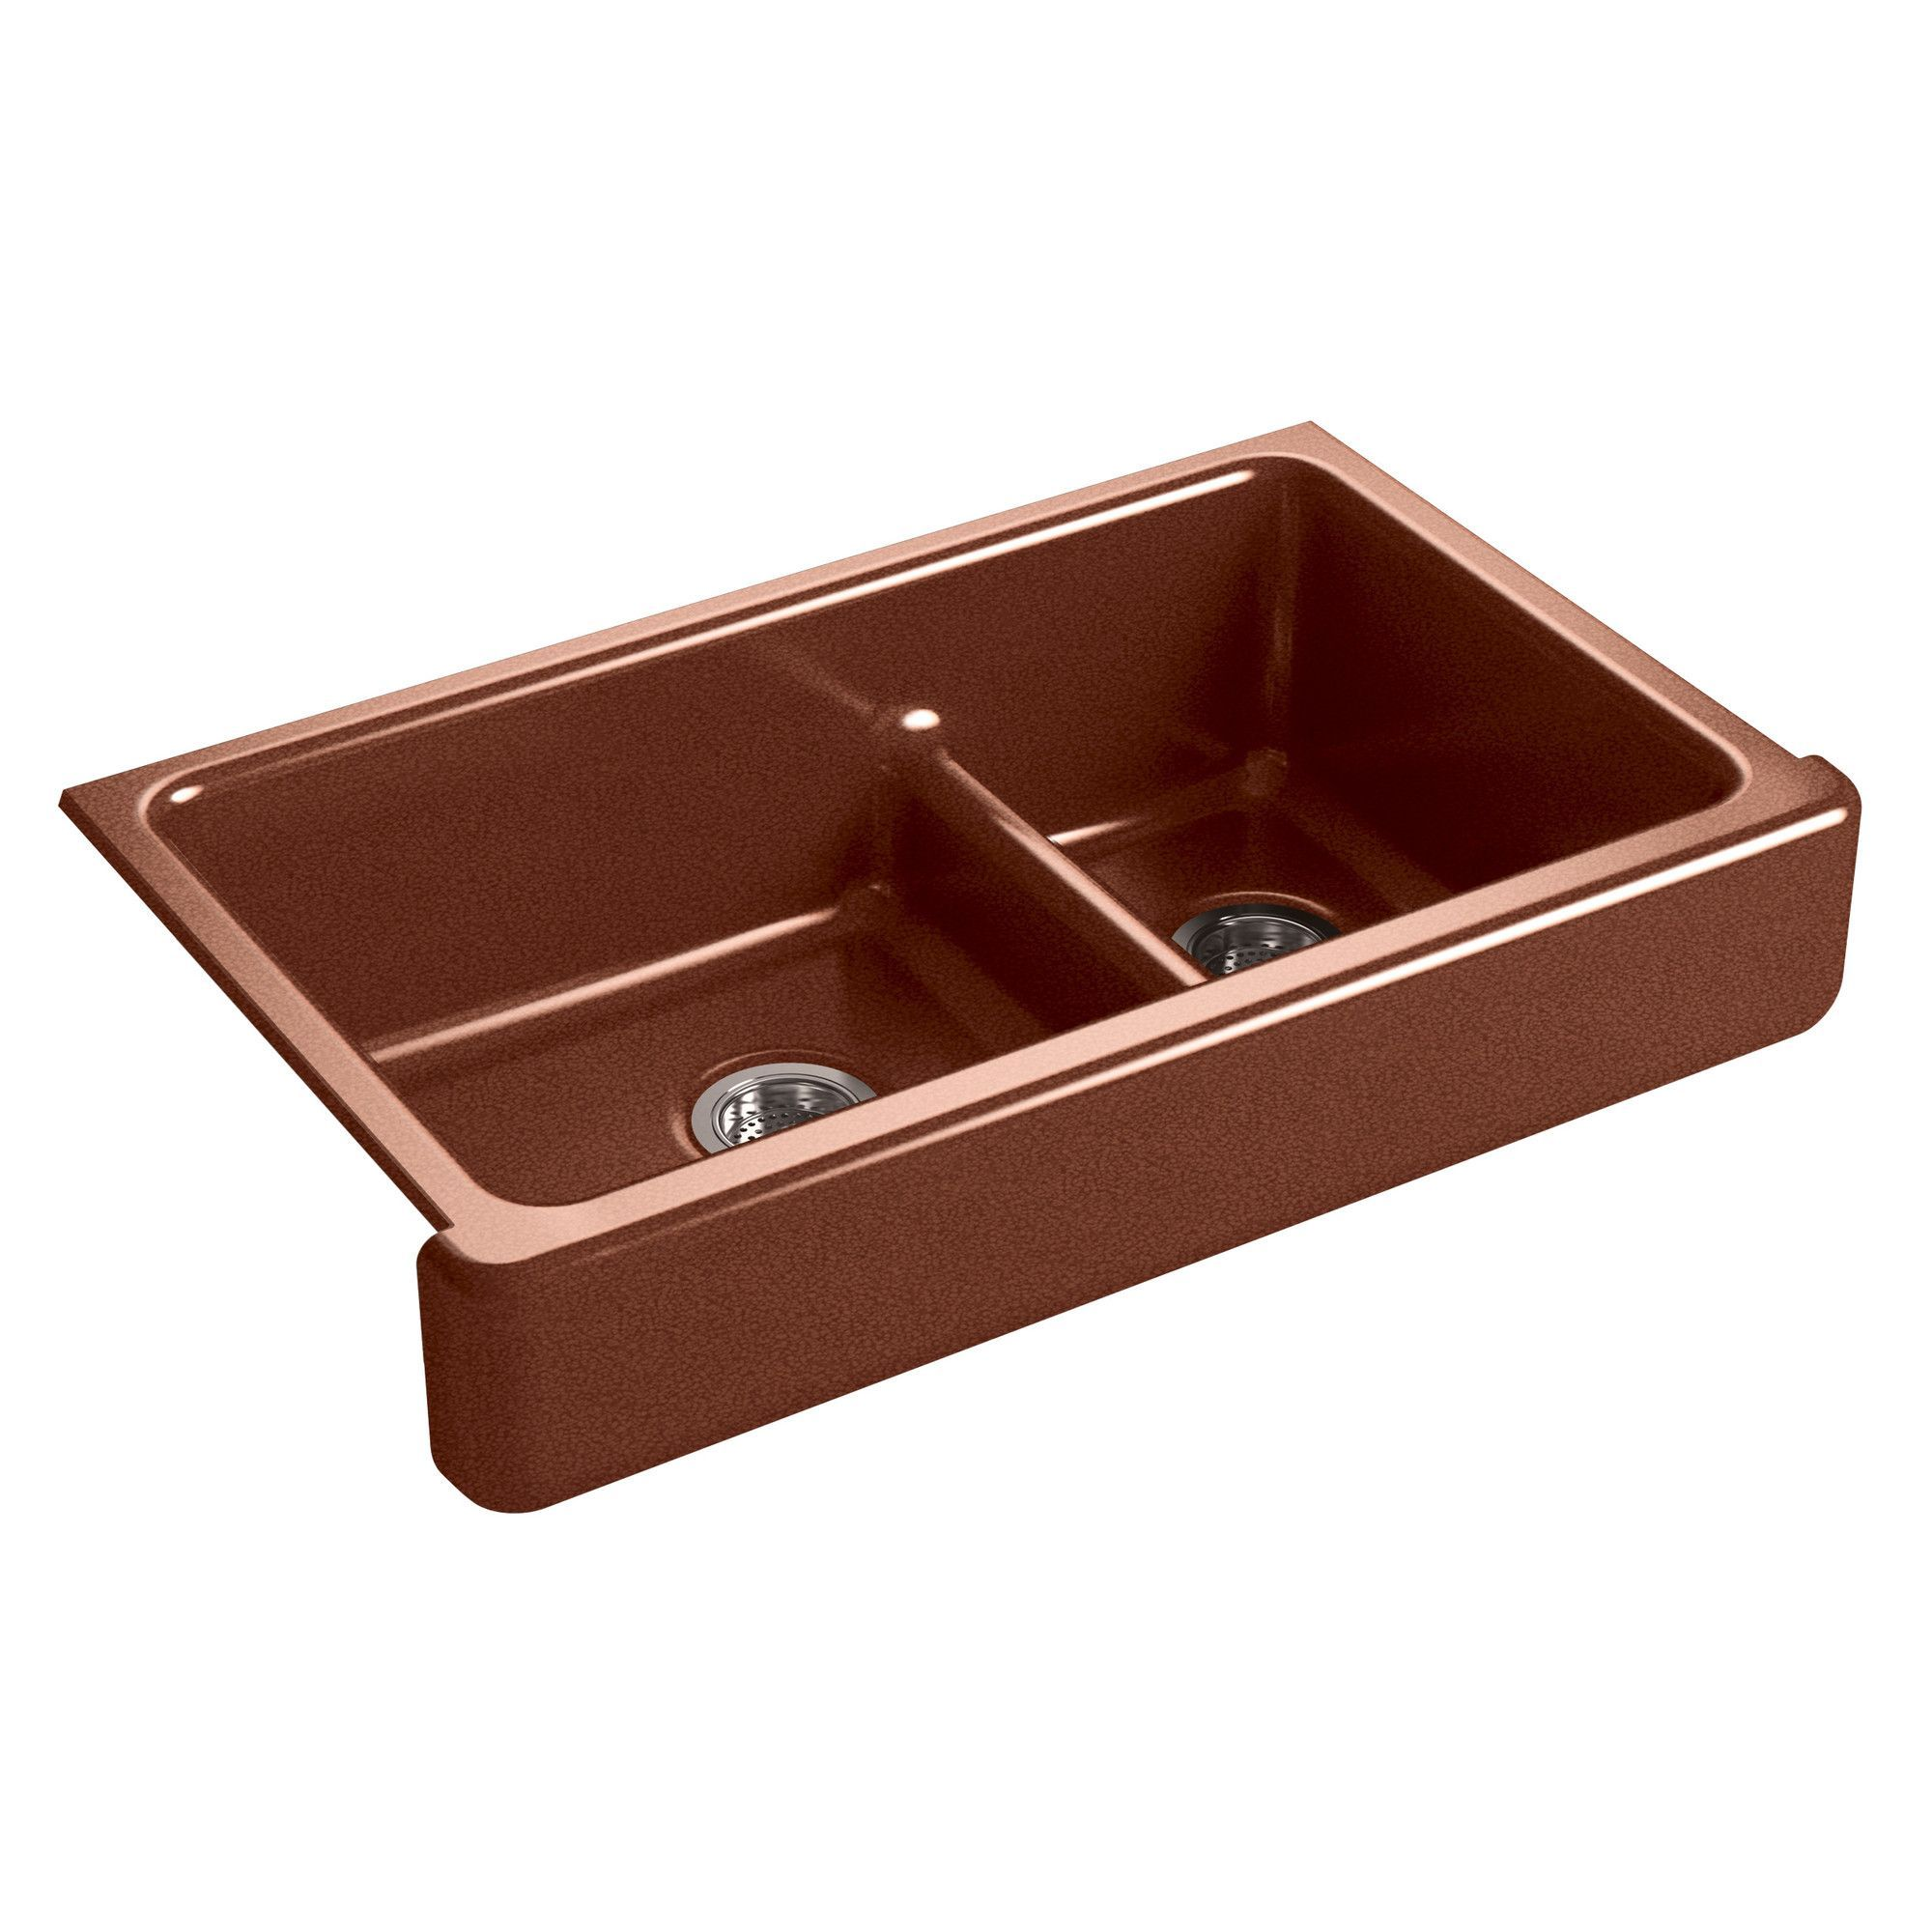 "Whitehaven Self-Trimming Smart Divide 35-1/2"" x 21-9/16"" x 9-5/8"" Under-Mount Large/Medium Double-Bowl Kitchen Sink with Short Apron"